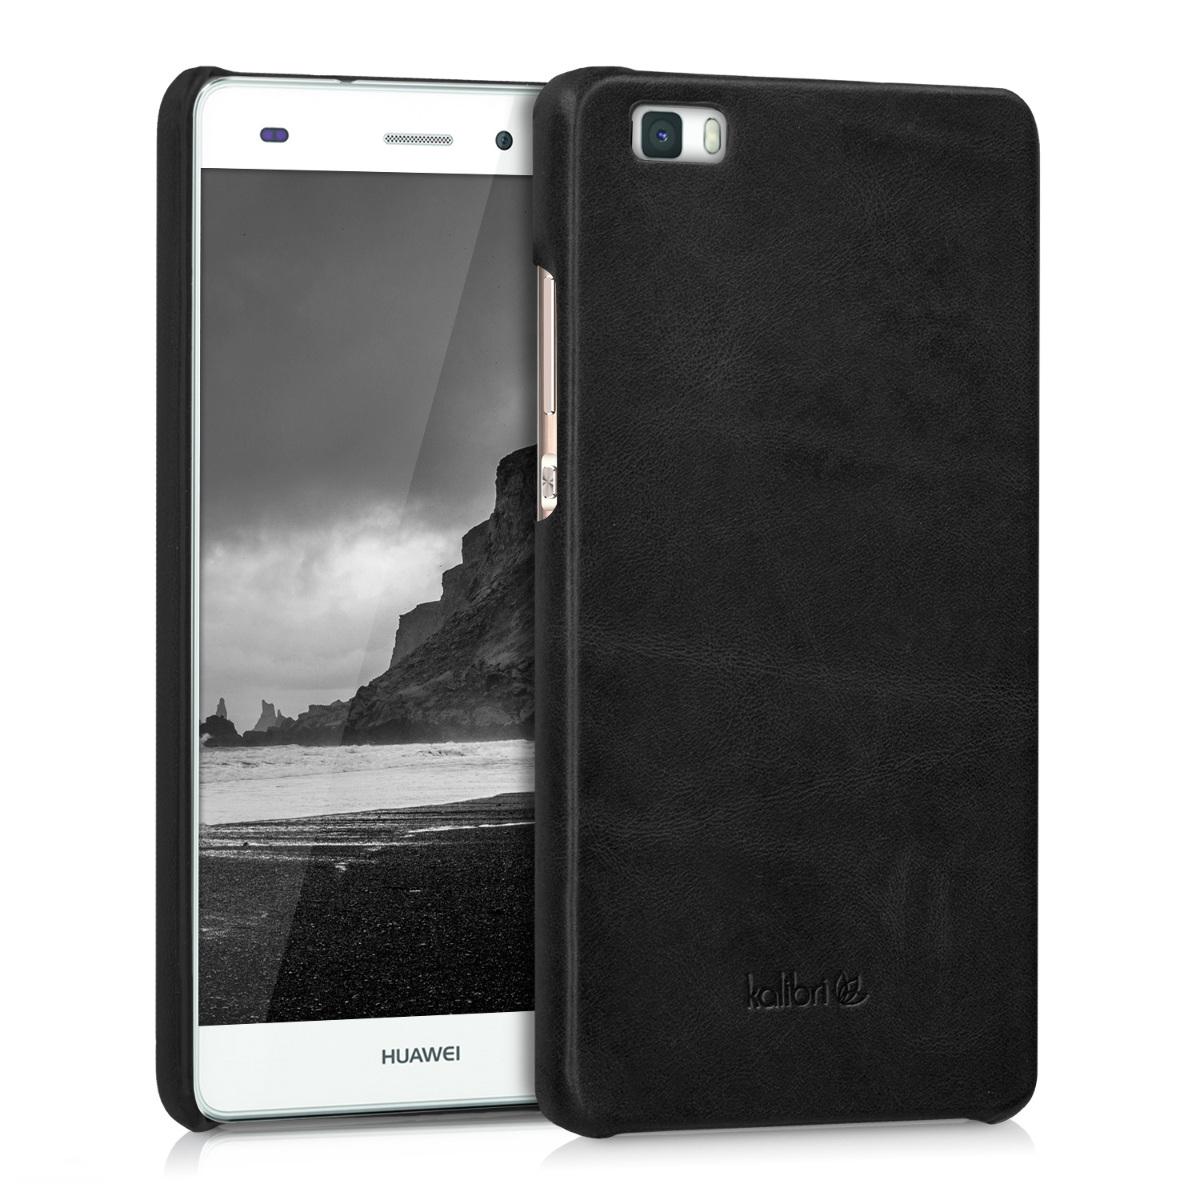 Kalibri Σκληρή Δερμάτινη Θήκη Huawei P8 Lite - Black (38966.01)